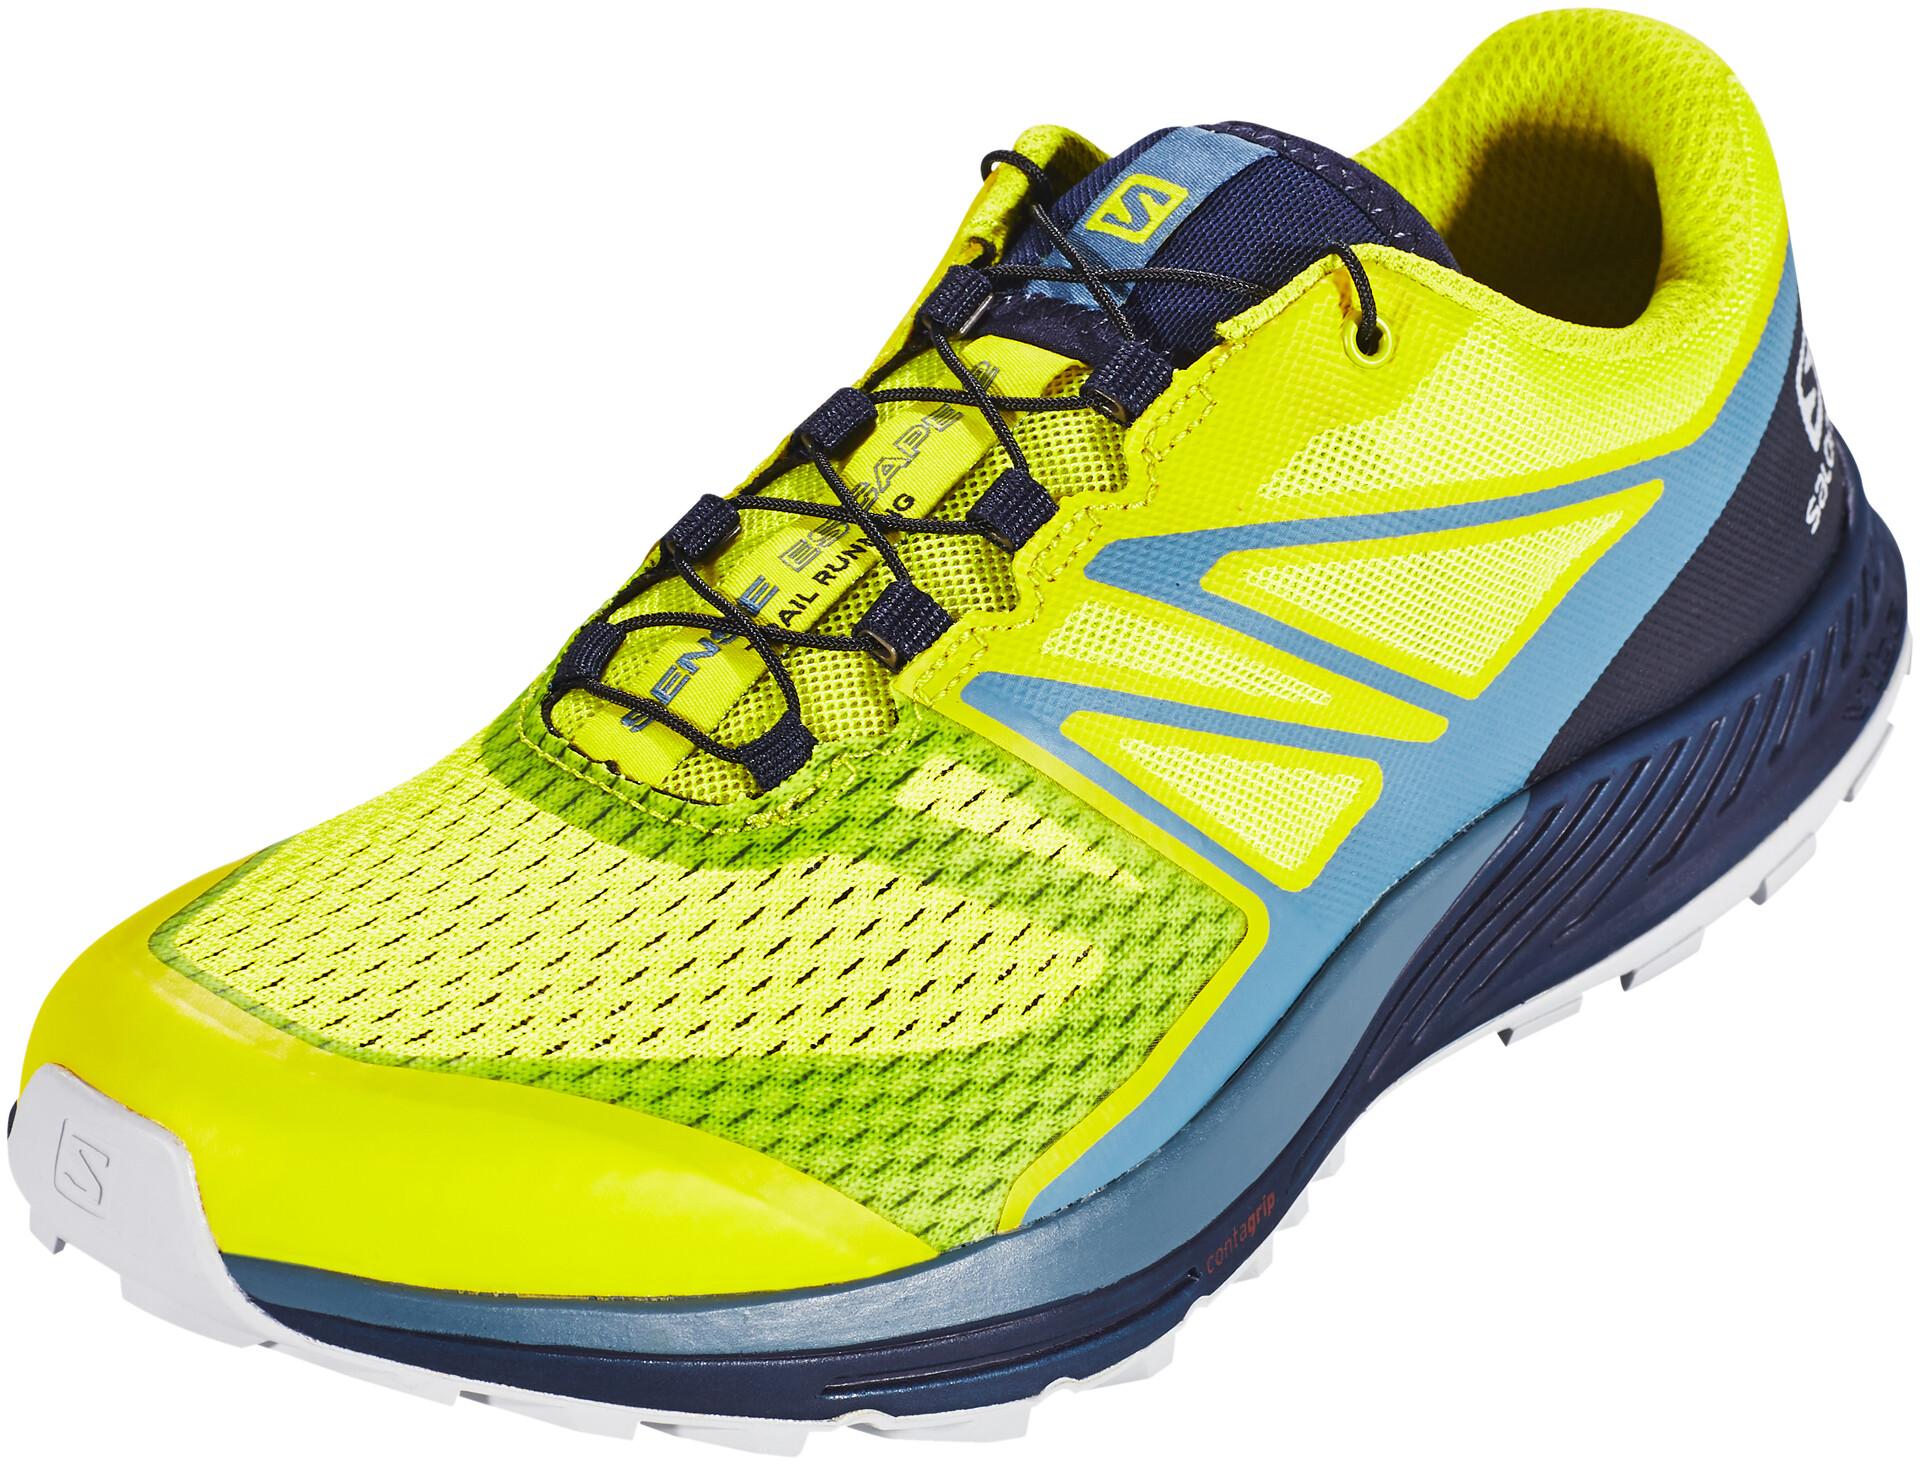 Chaussures de Trail Running Pointure: 40 Stormy Weather//Black//Stormy Weather Gris Salomon Homme Speedcross 4